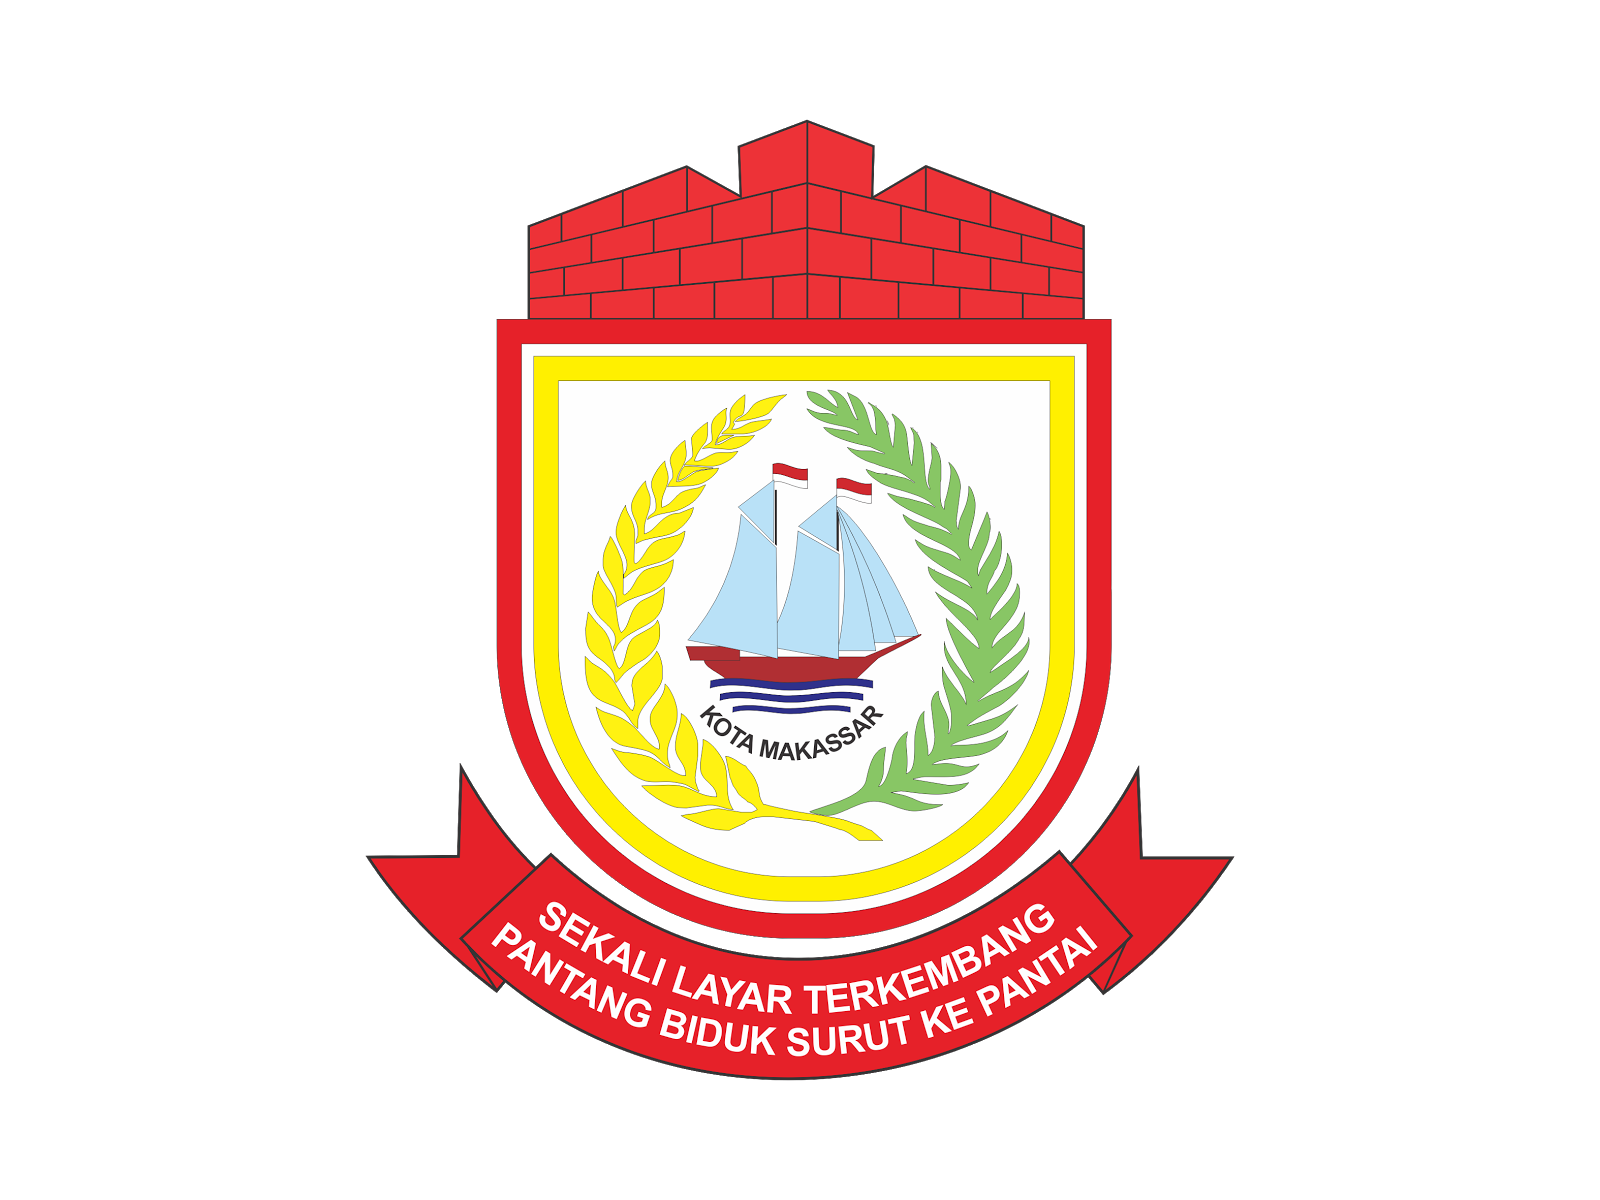 Logo Kota Makassar Vector Cdr Png Hd Biologizone